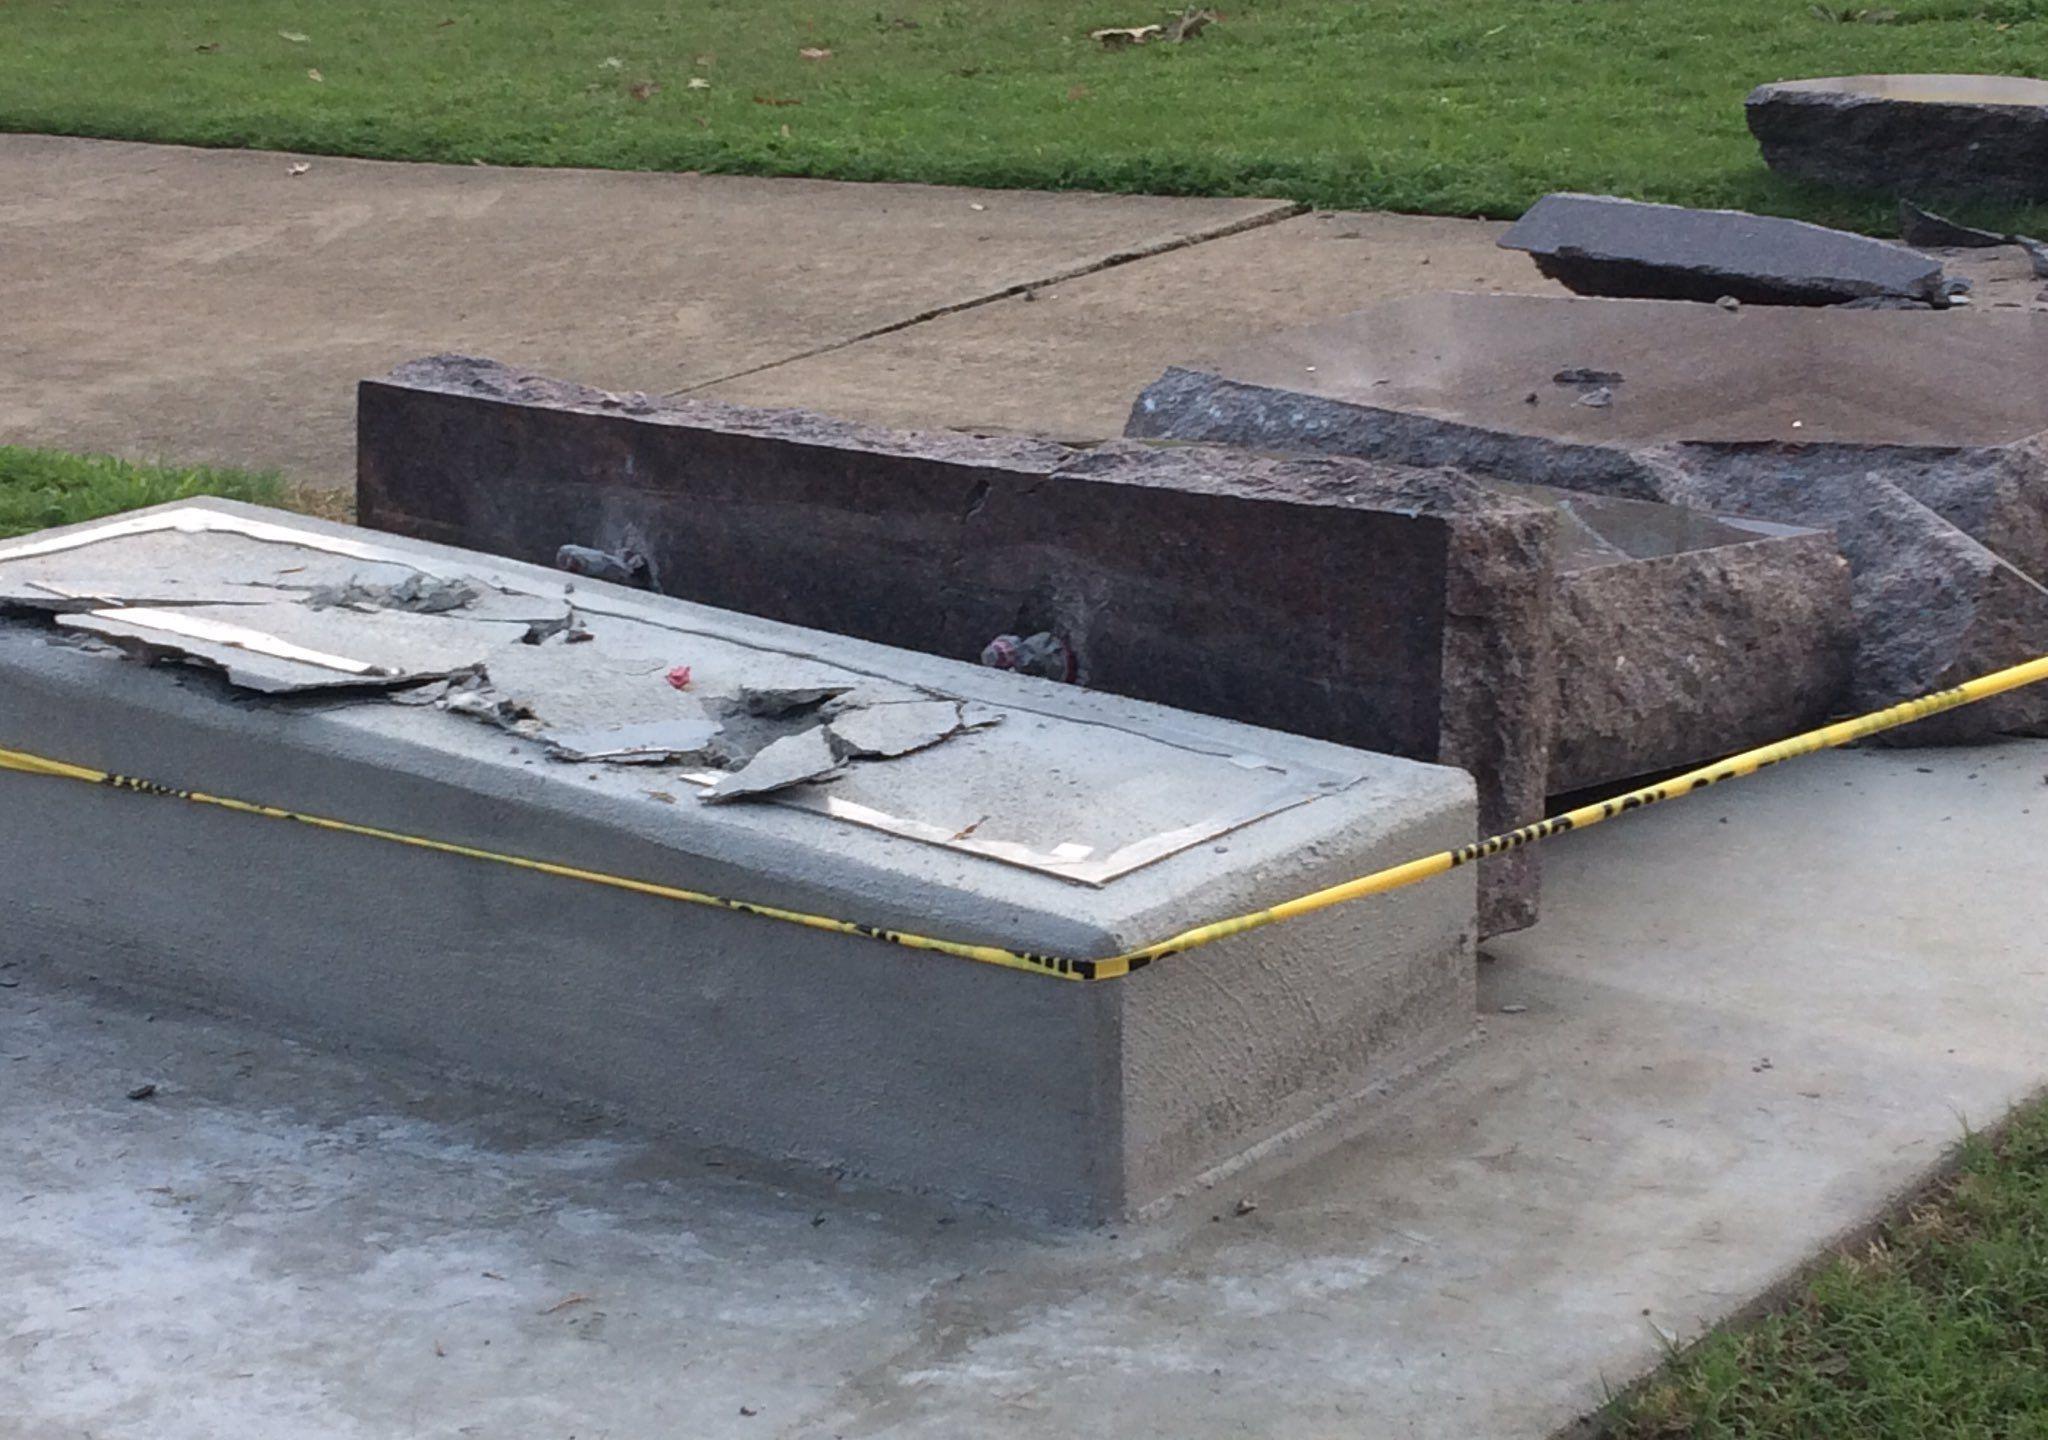 10 Commandments monument destroyed_1498659902820.jpg